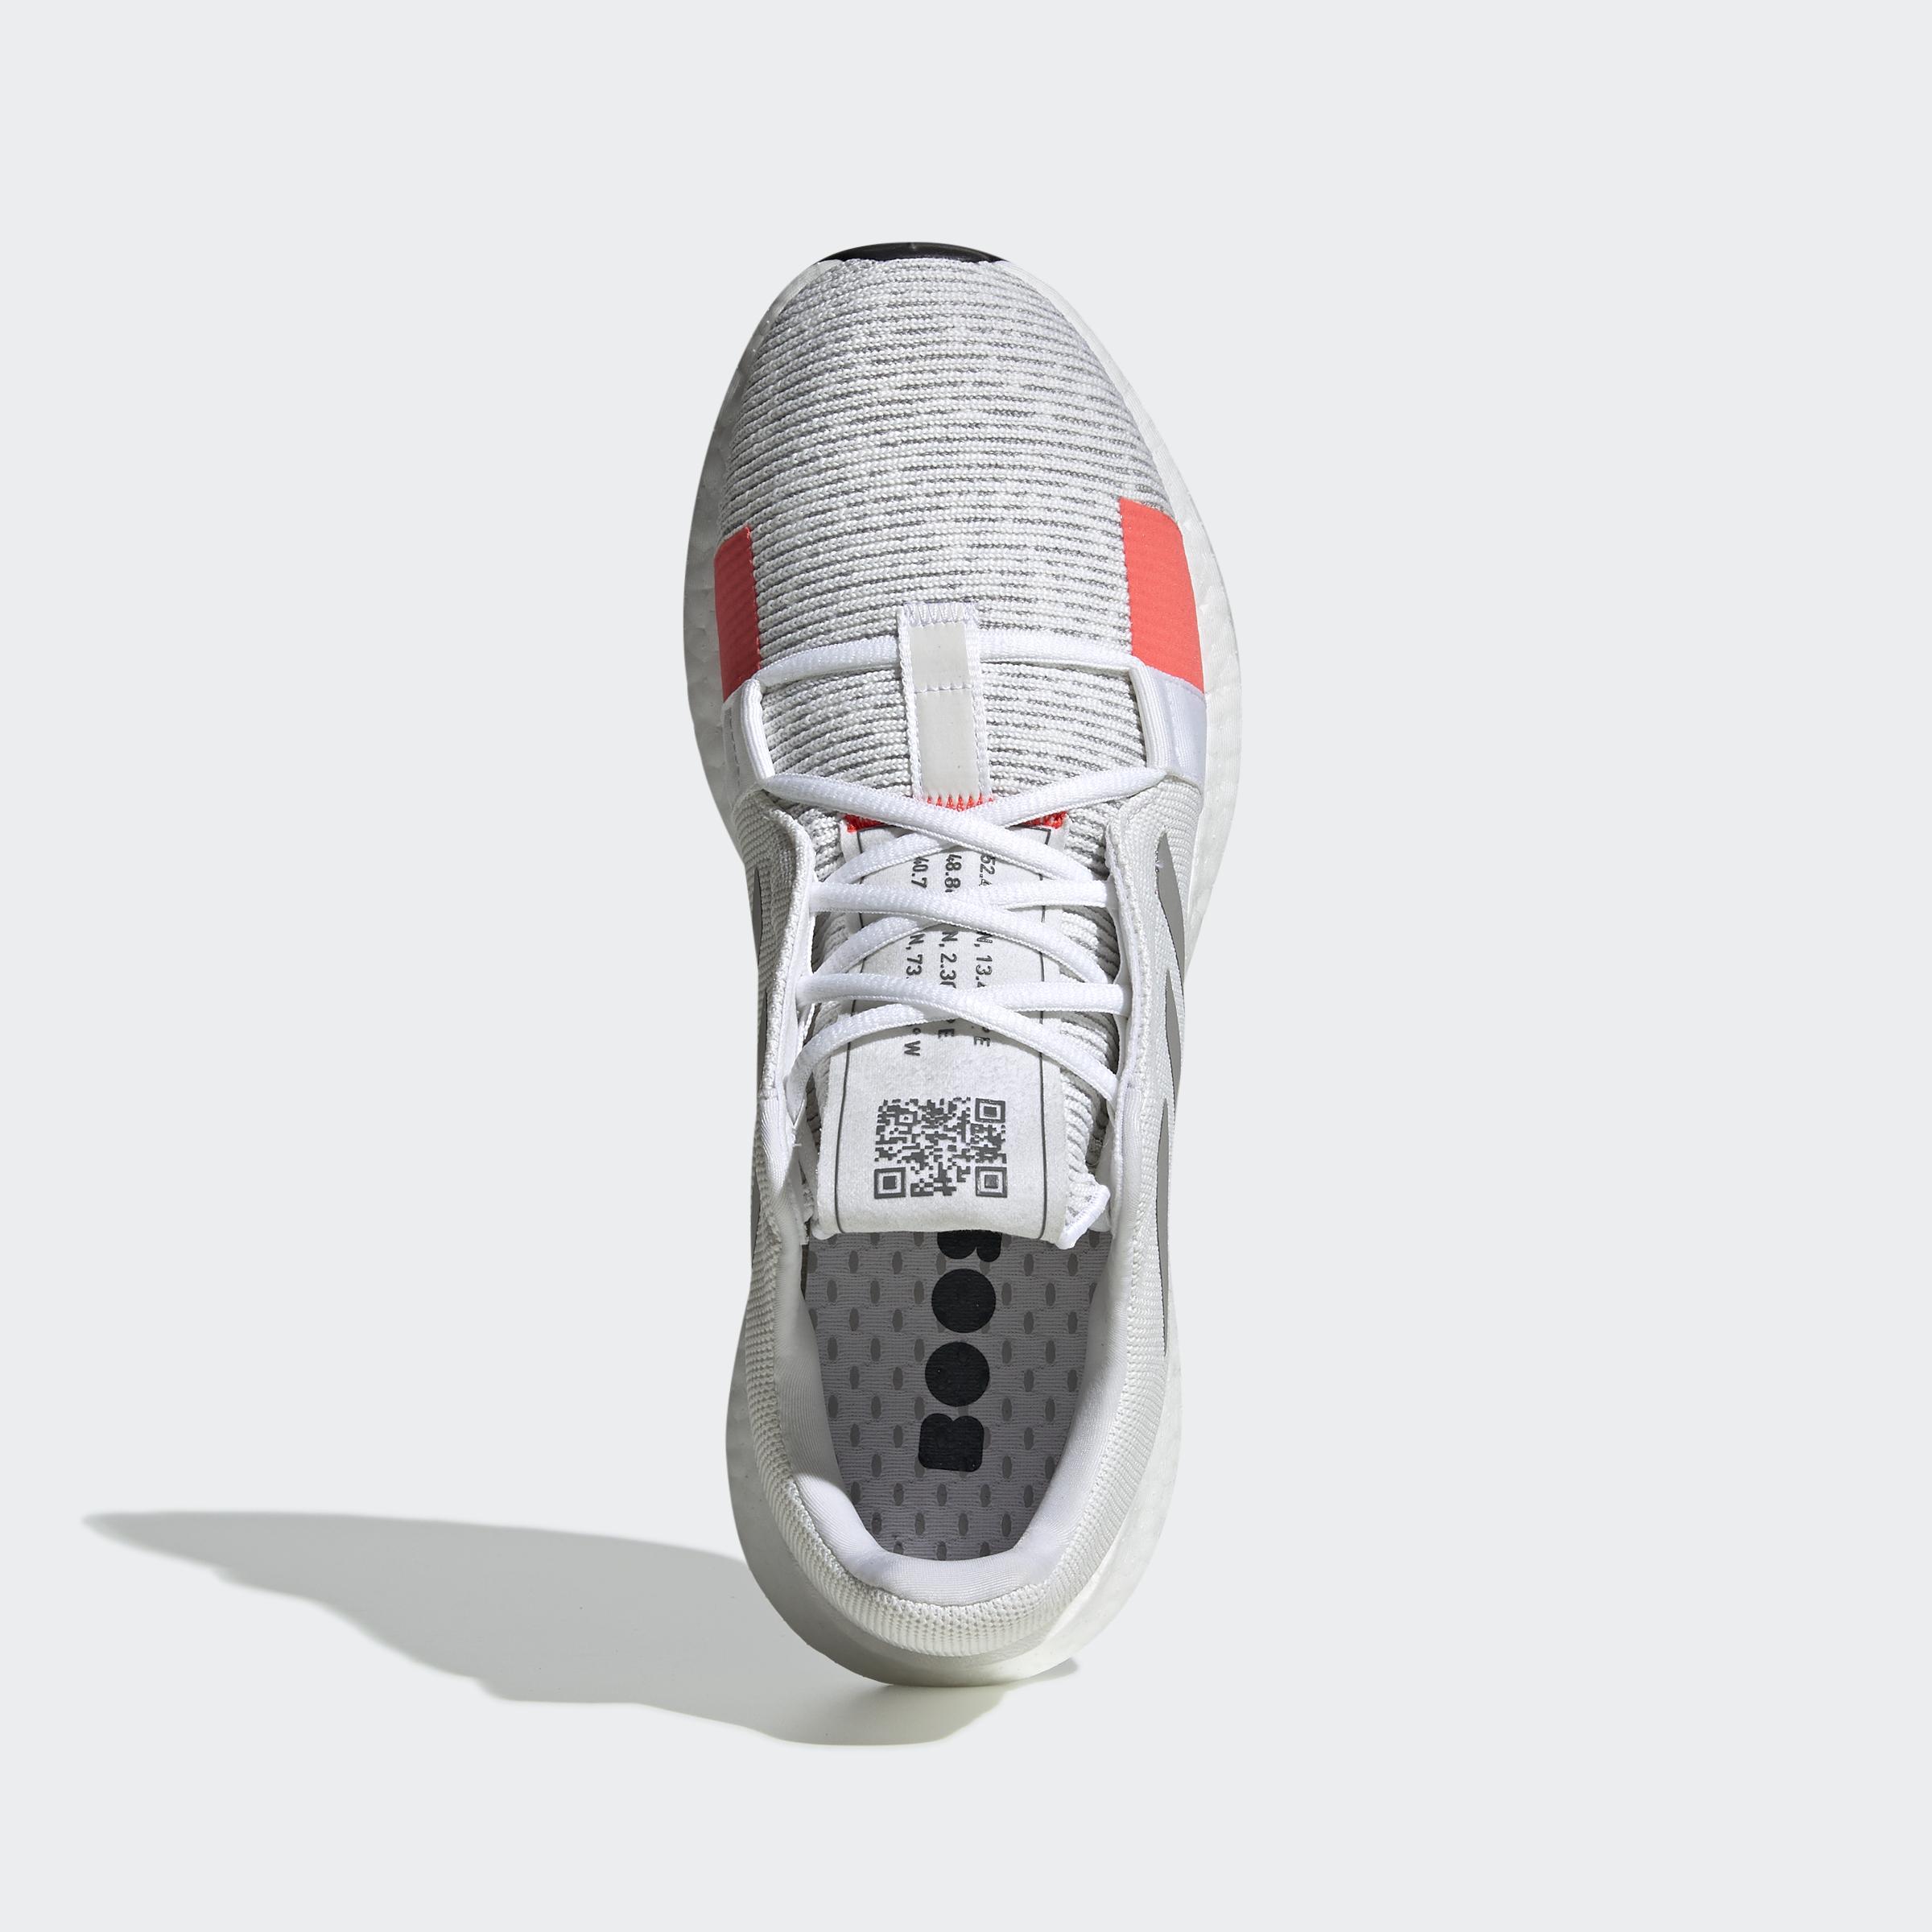 miniature 58 - adidas Senseboost Go Shoes Men's Athletic & Sneakers